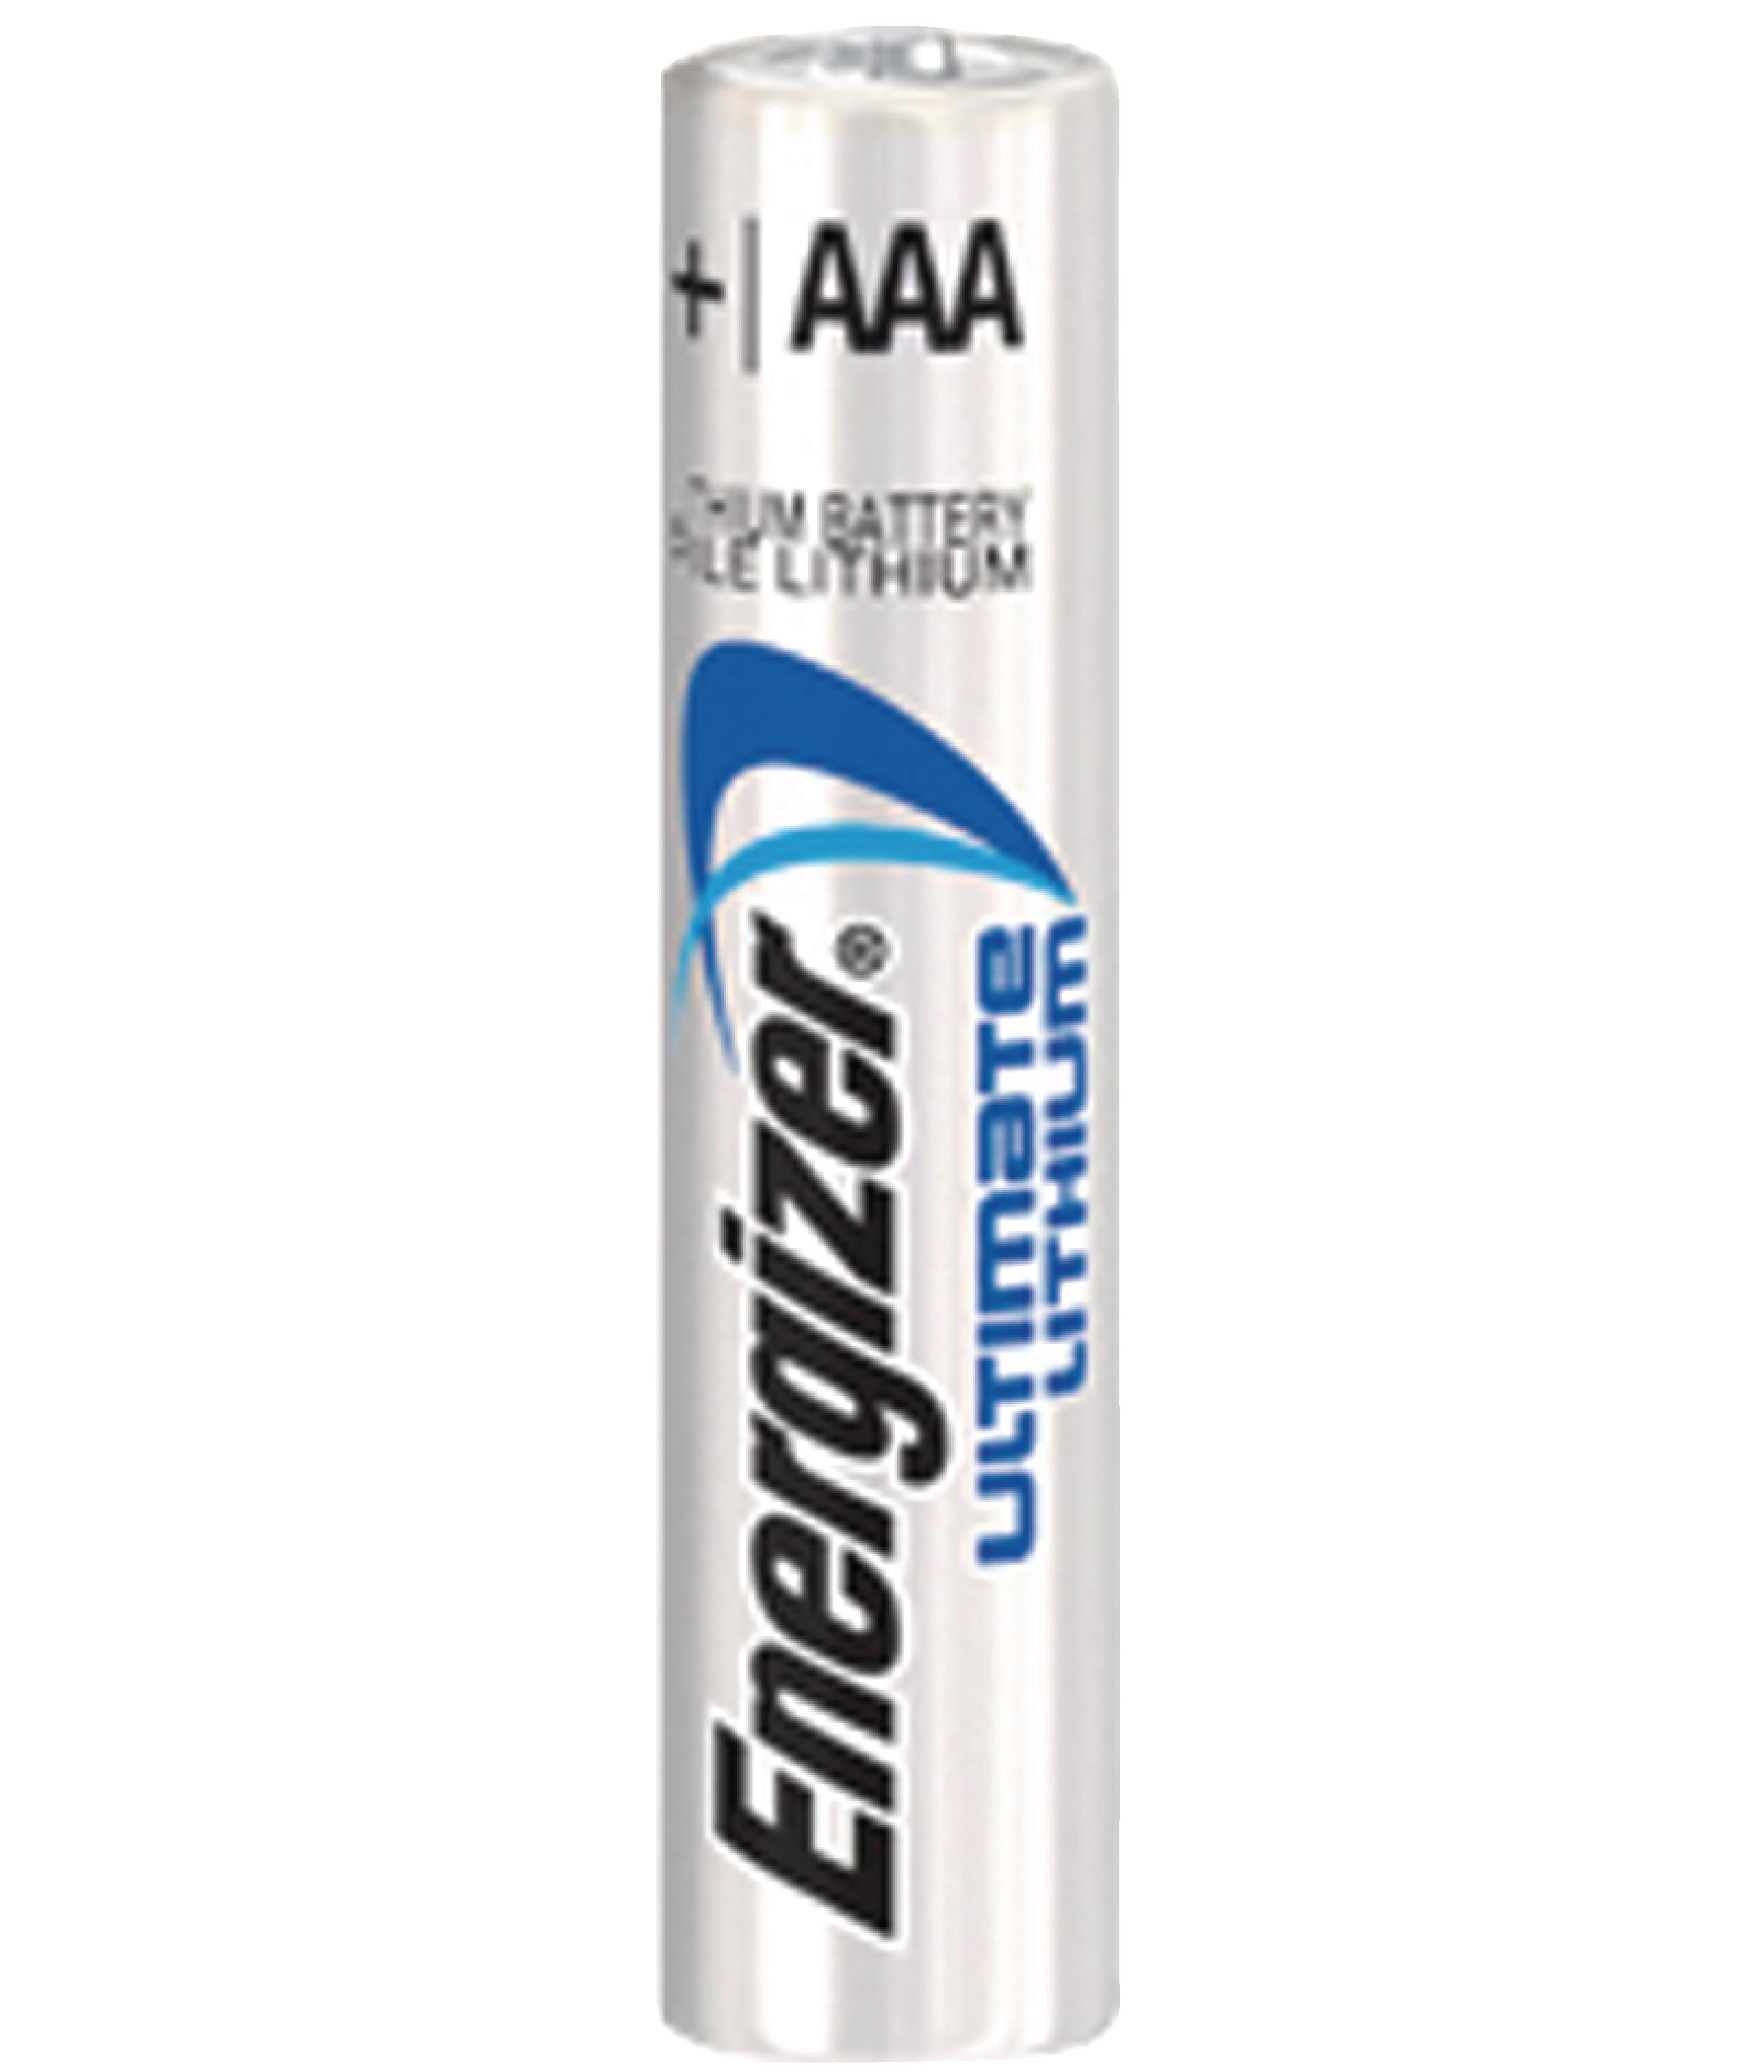 ENLITHIUMAAAP4 - Energizer - Lithium Battery AAA 1.5 V